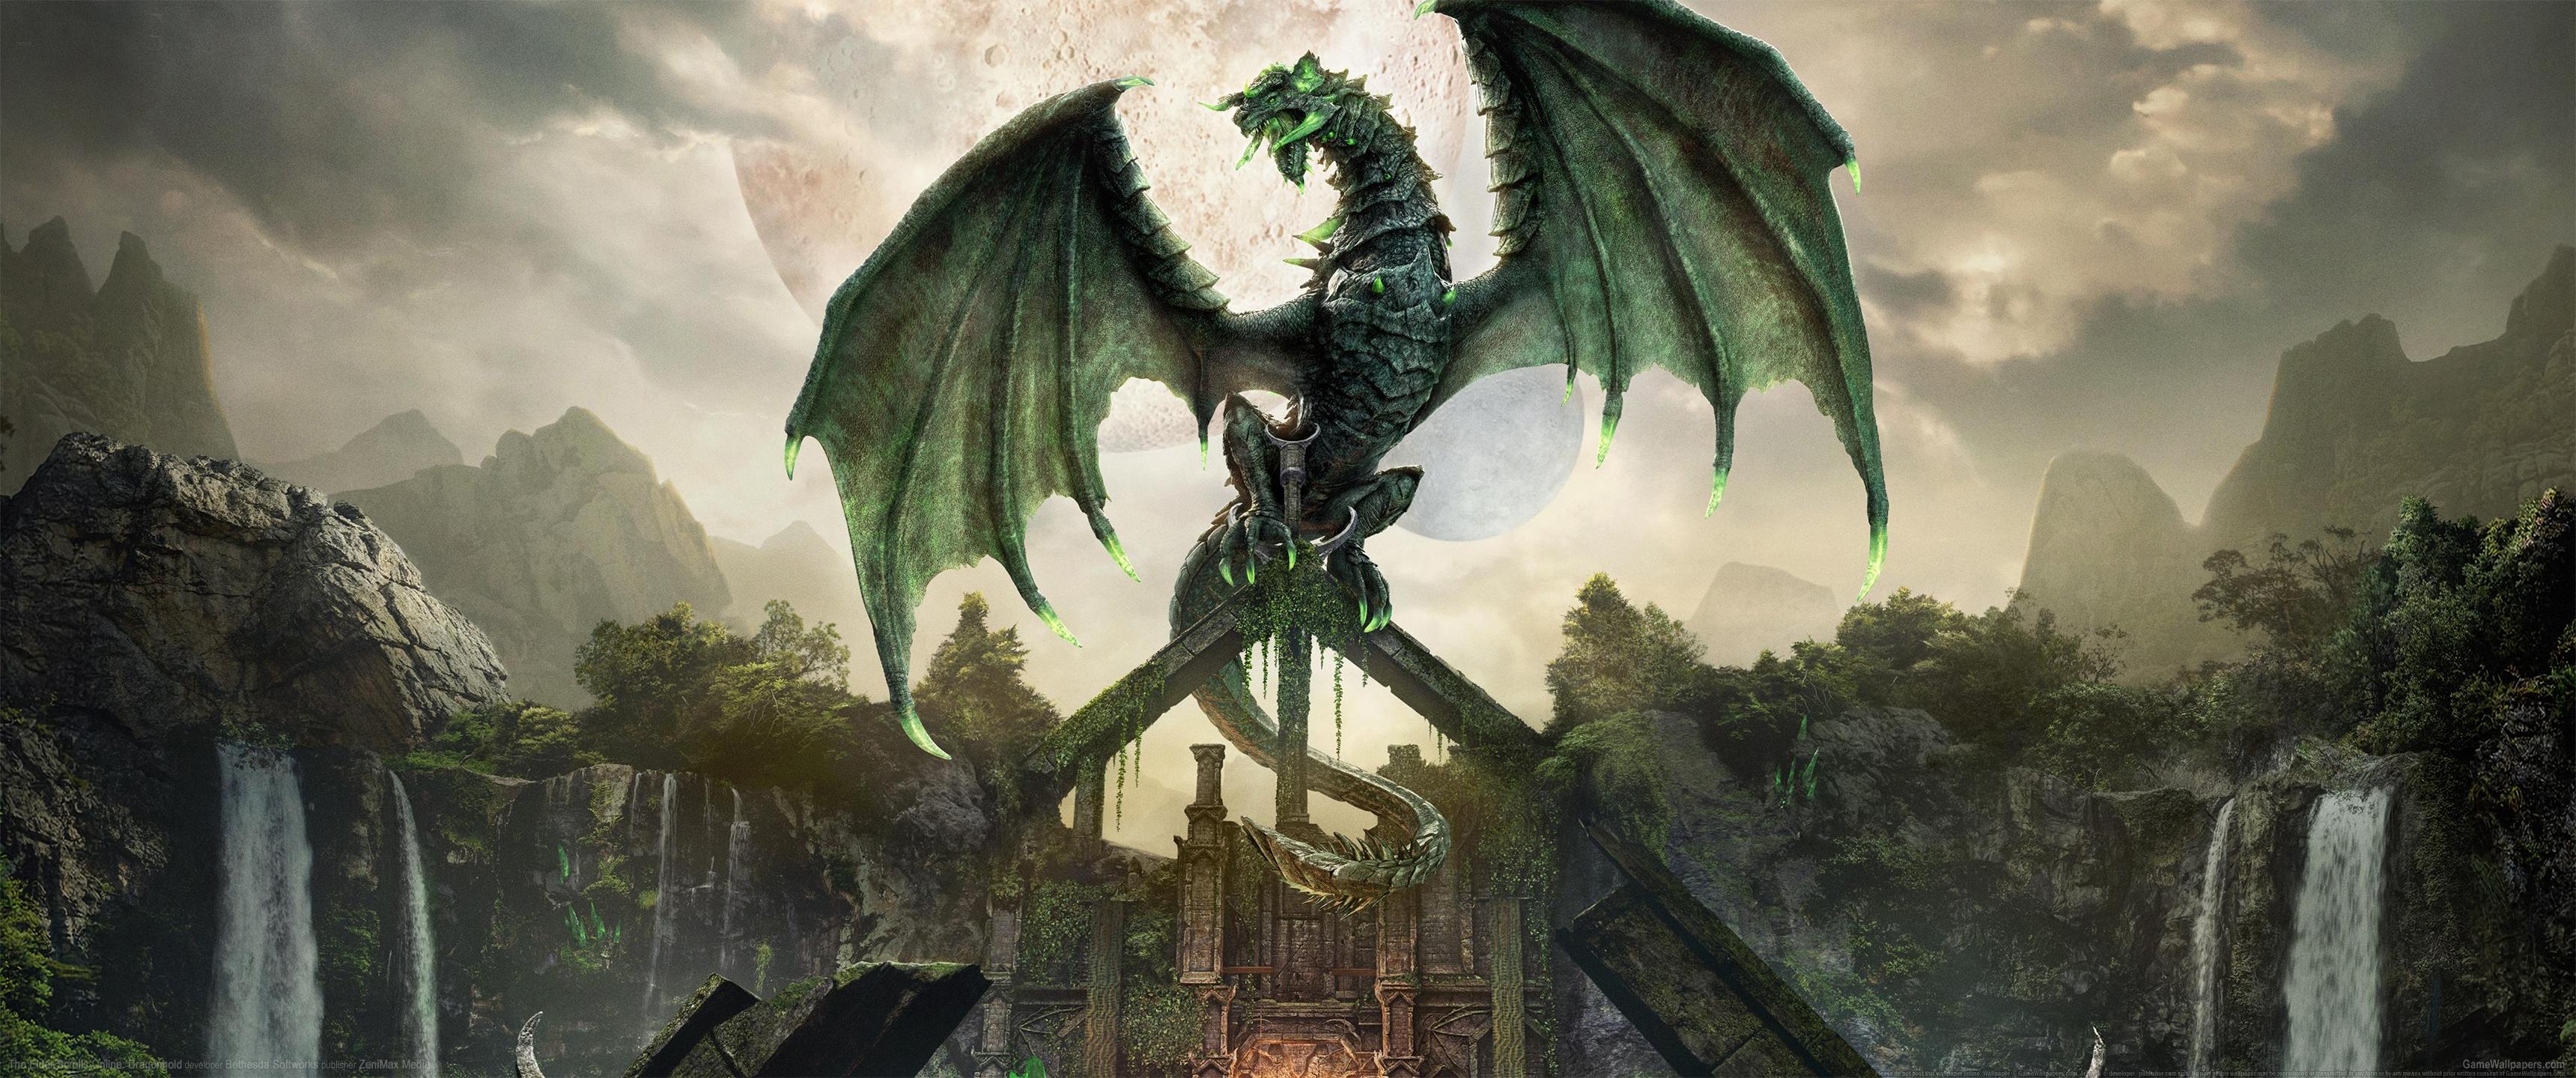 The Elder Scrolls Online: Dragonhold 3440x1440 fondo de escritorio 01